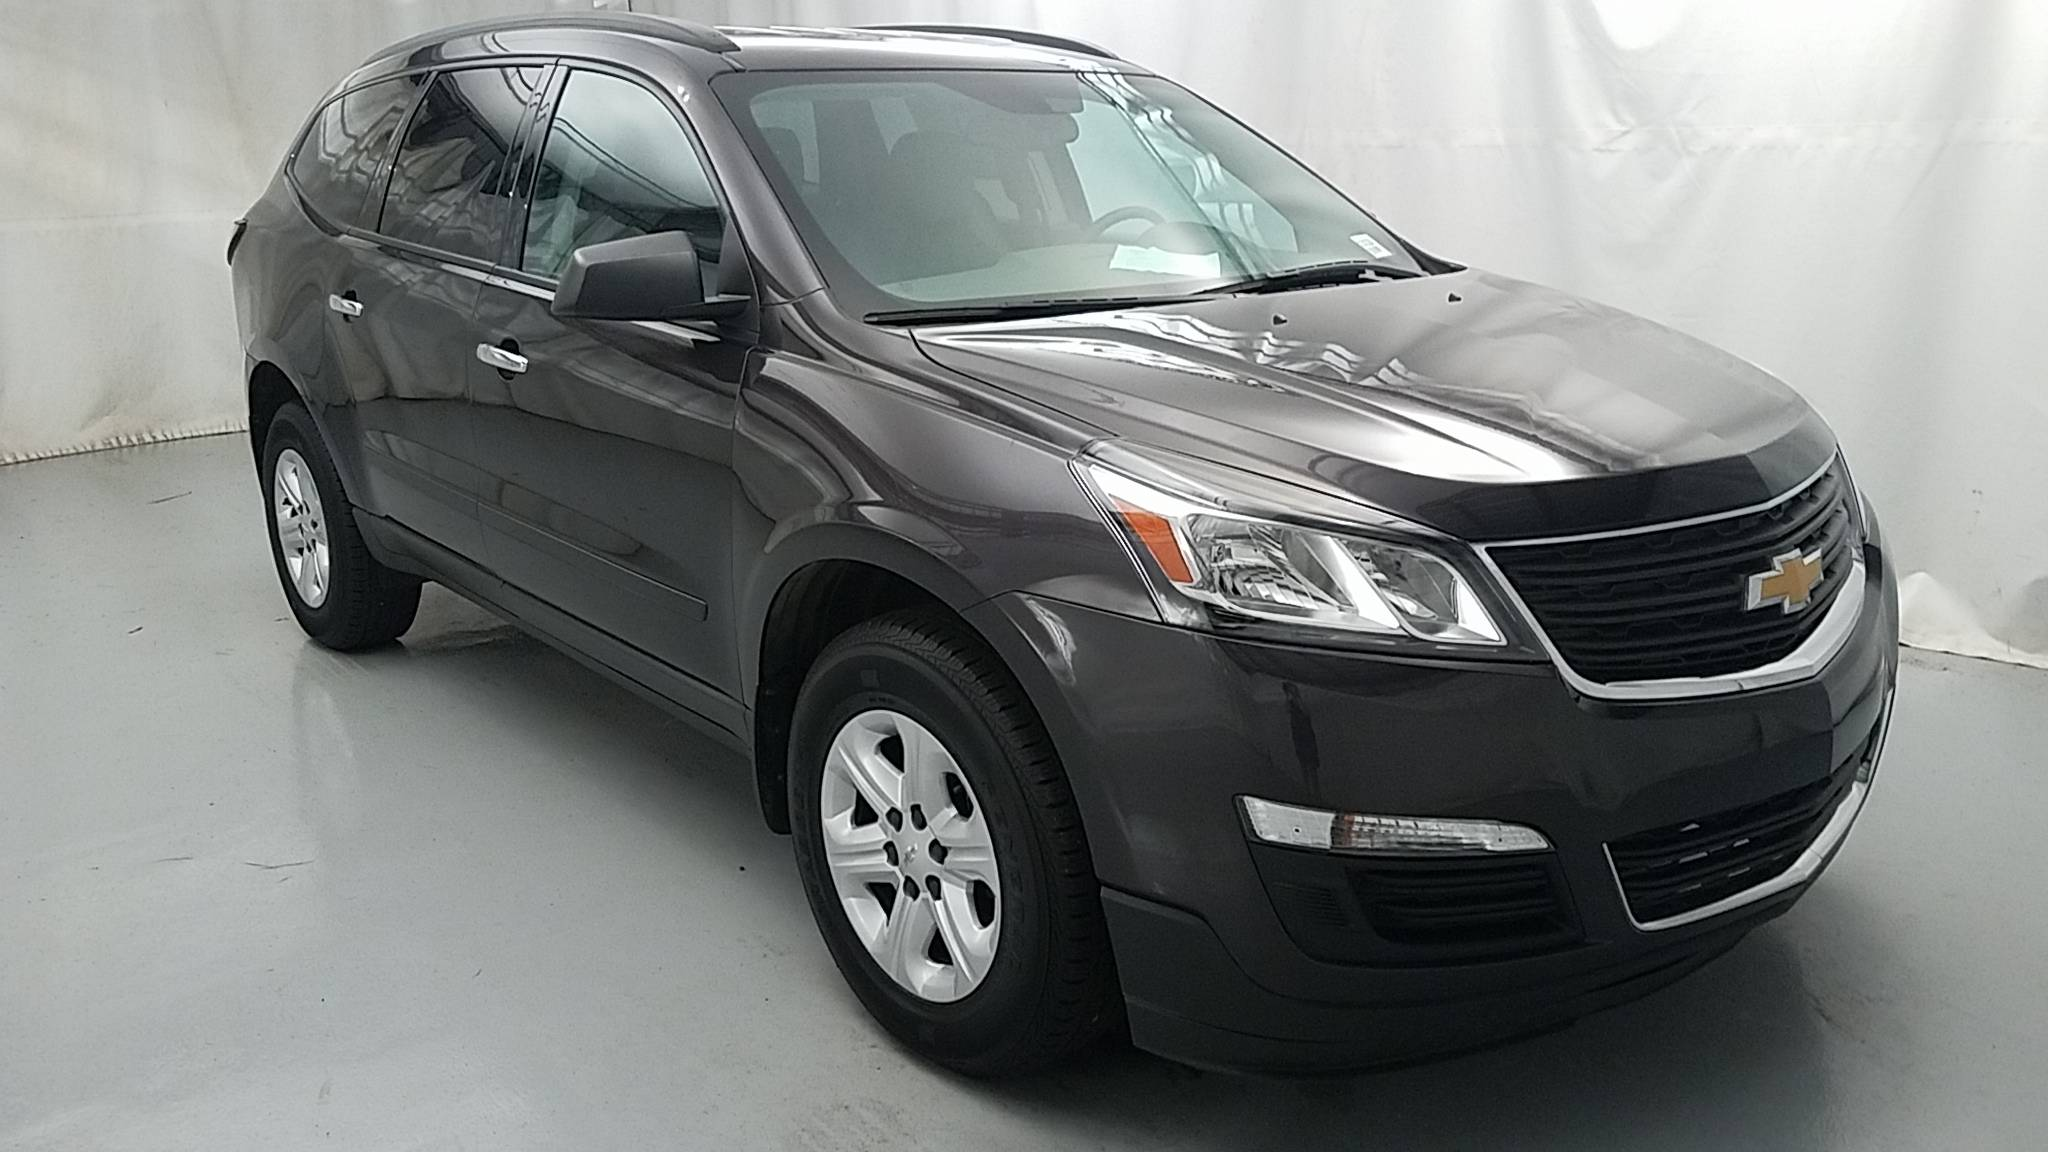 2016 Yukon XL Vehicles for Sale in Hammond LA